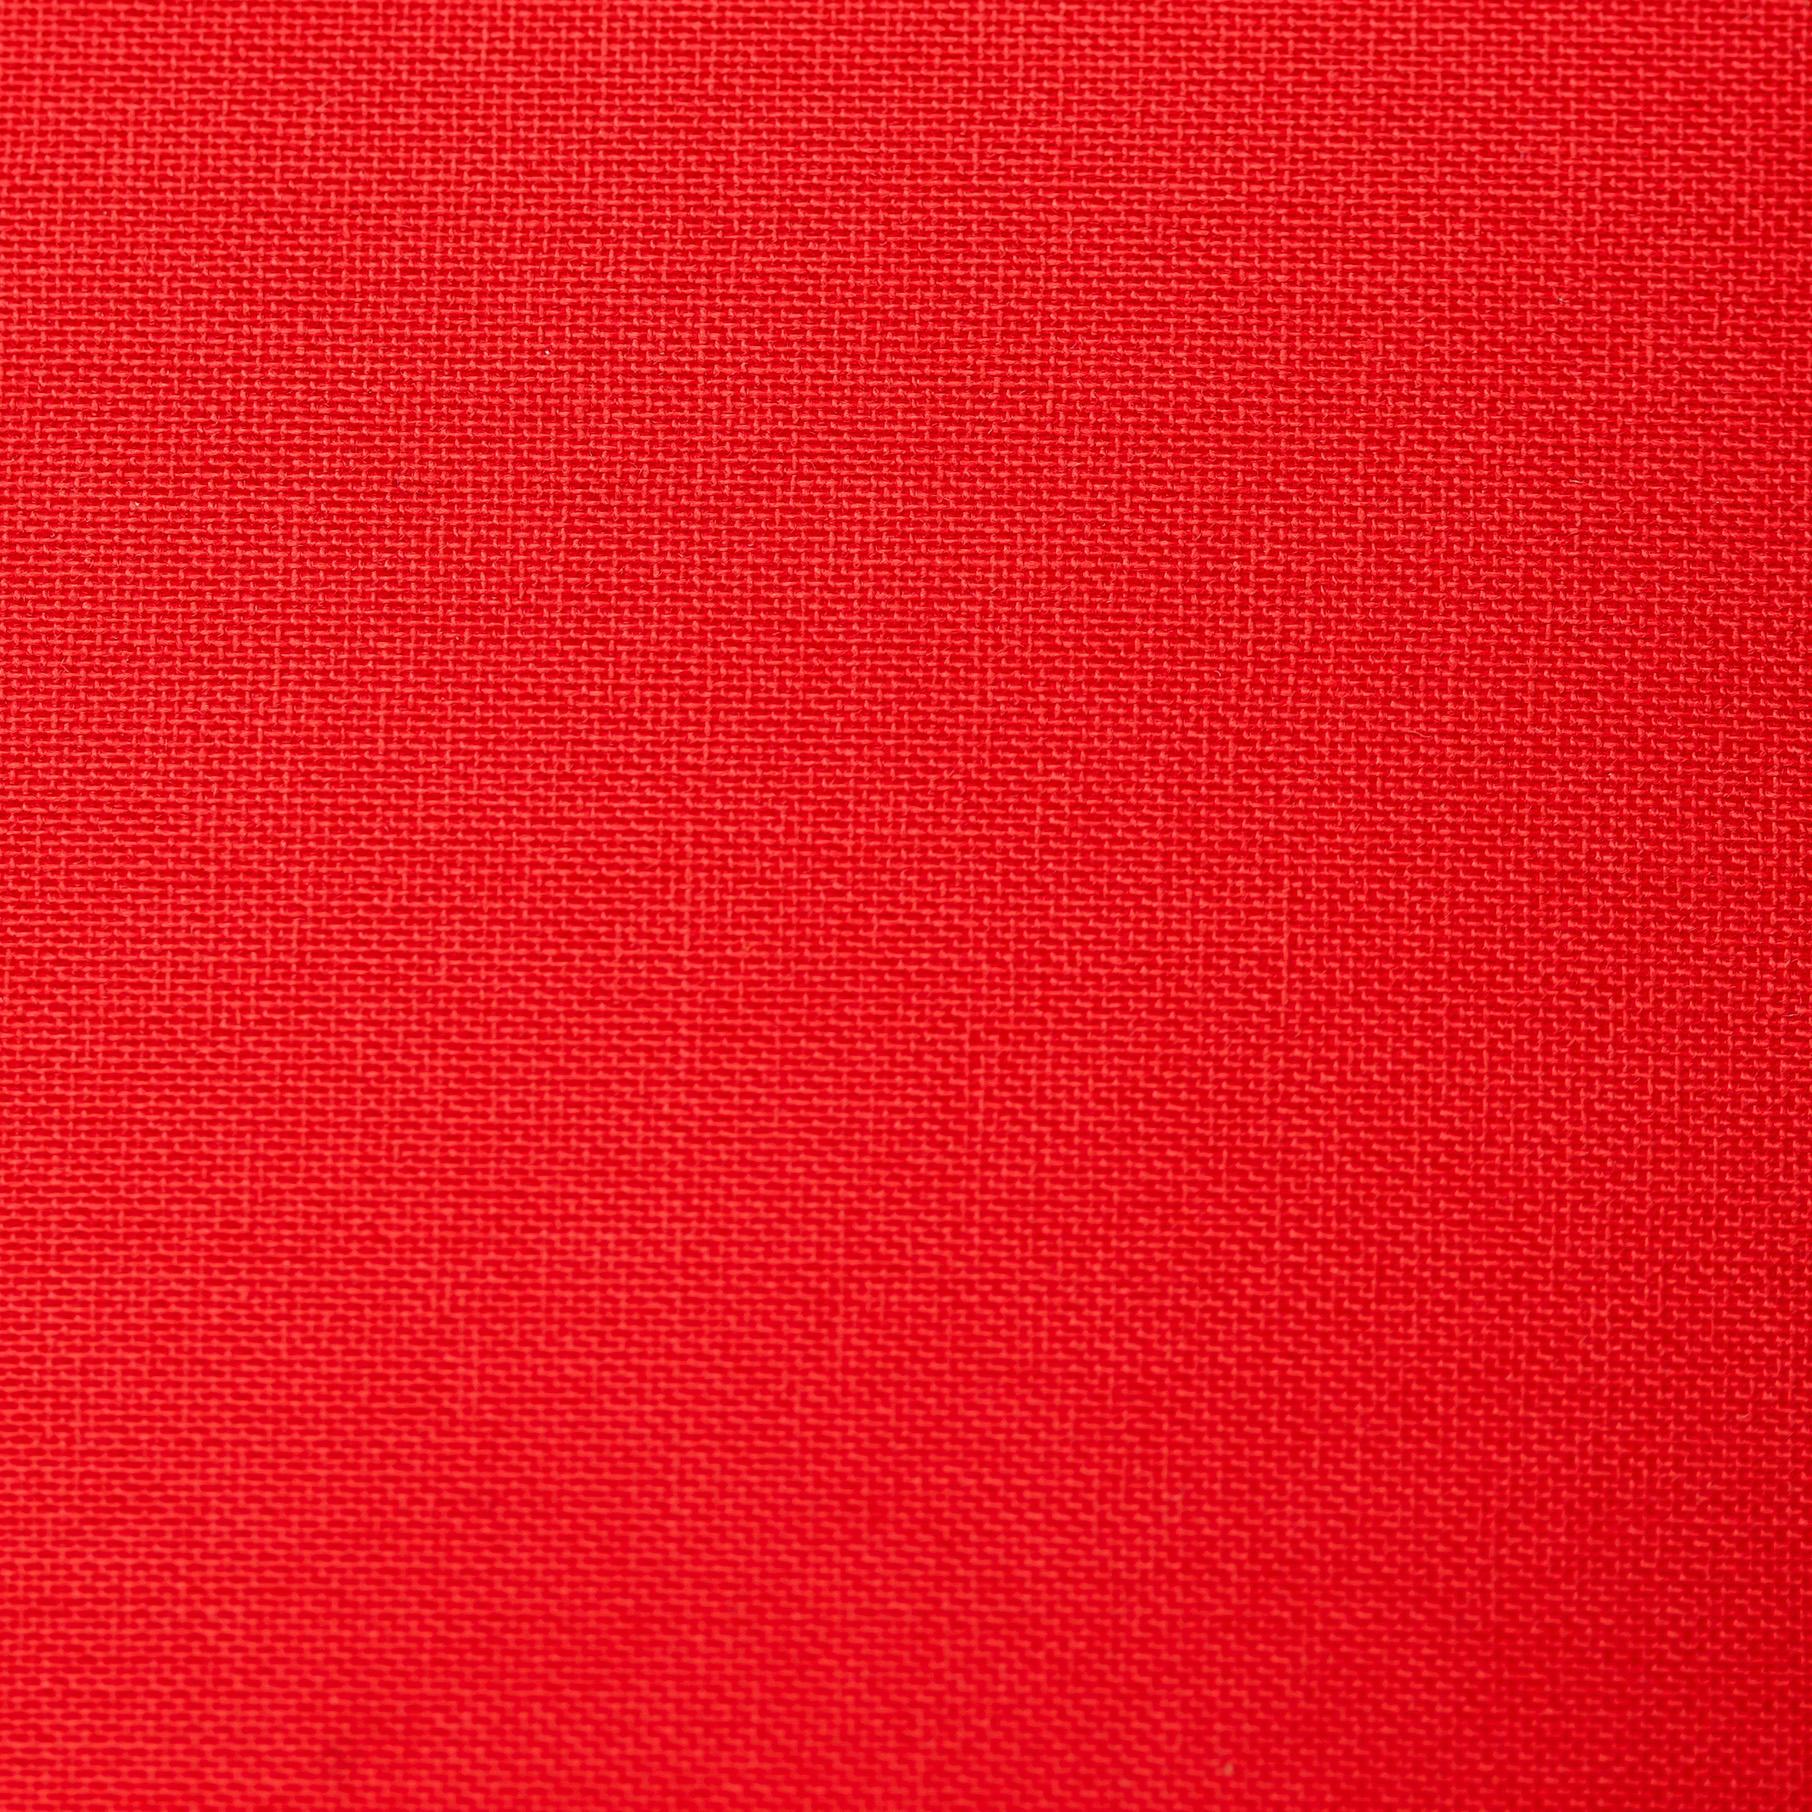 Linen_Red.jpg